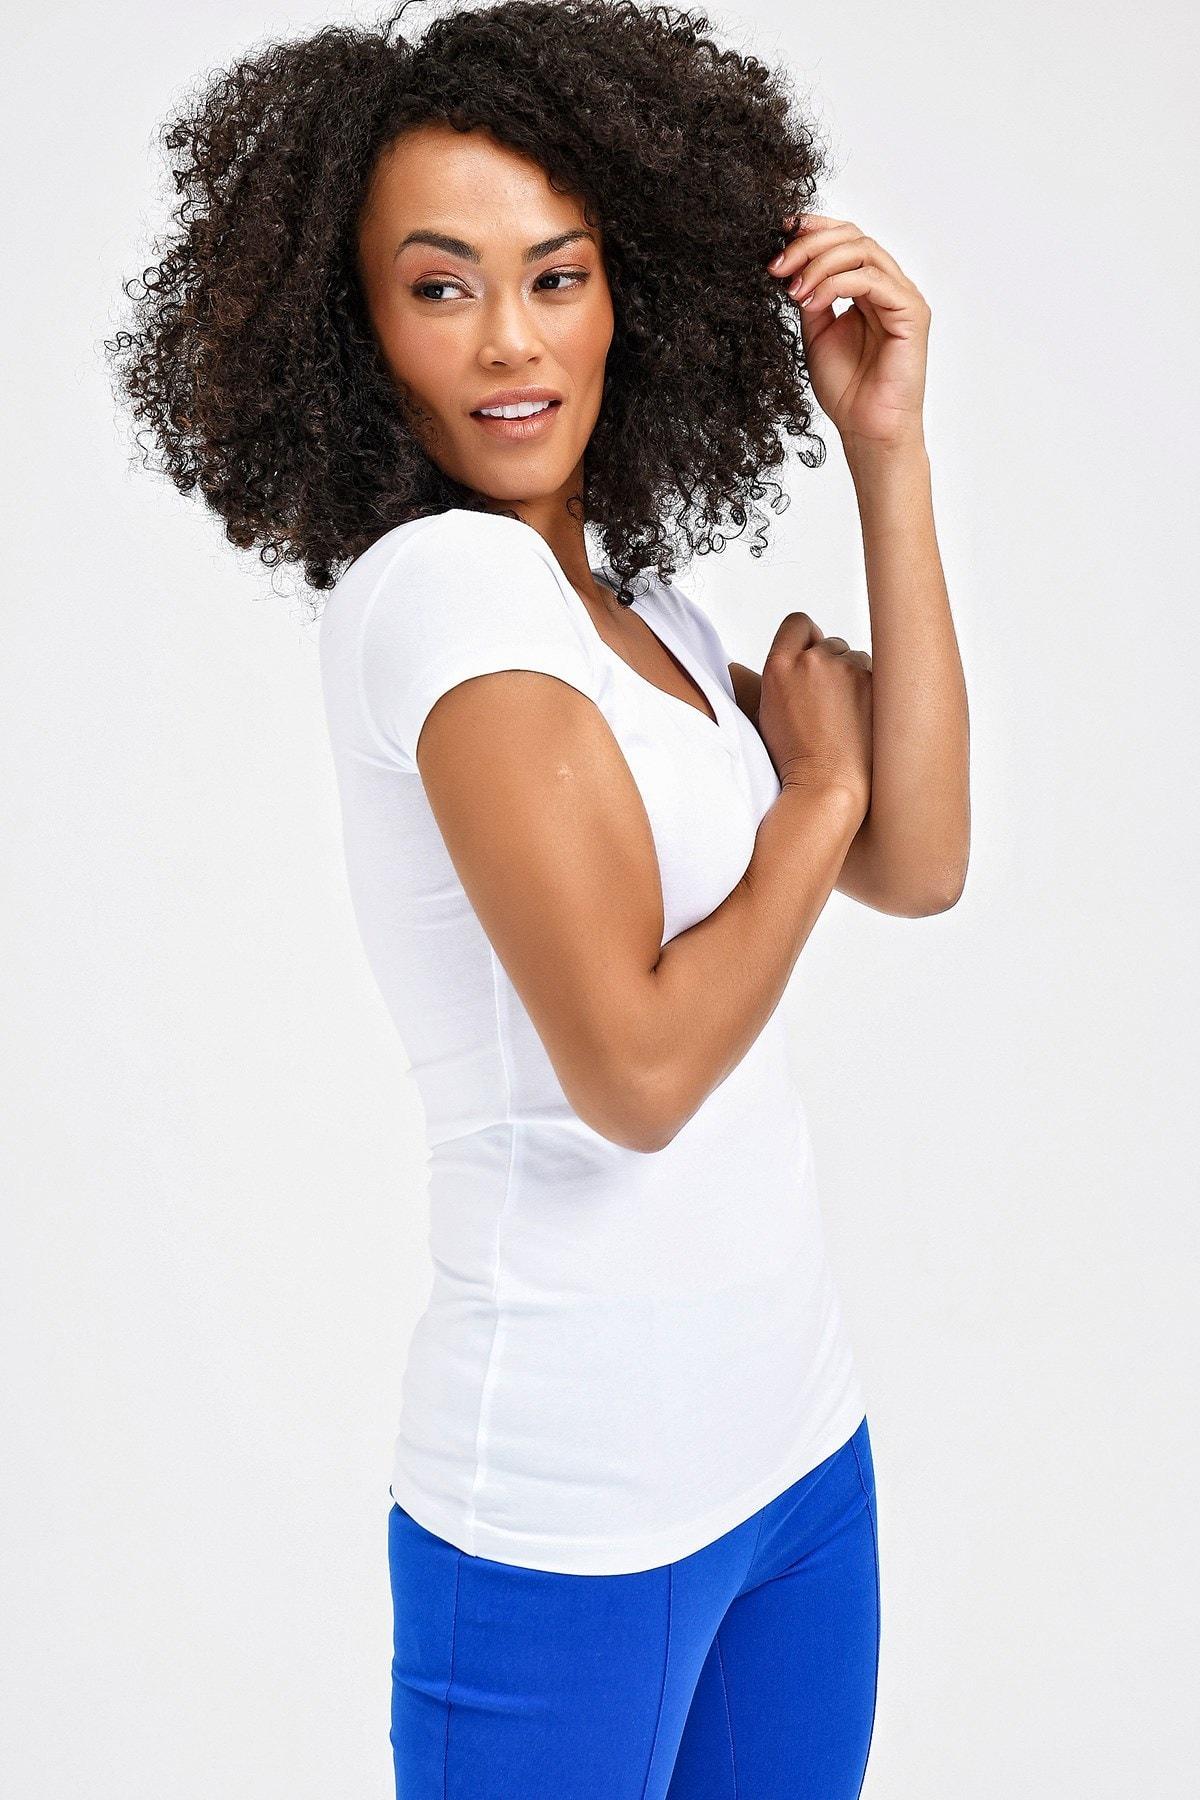 Jument Kadın Beyaz Ön-Arka V Yaka Kısa T-Shirt 5612 2